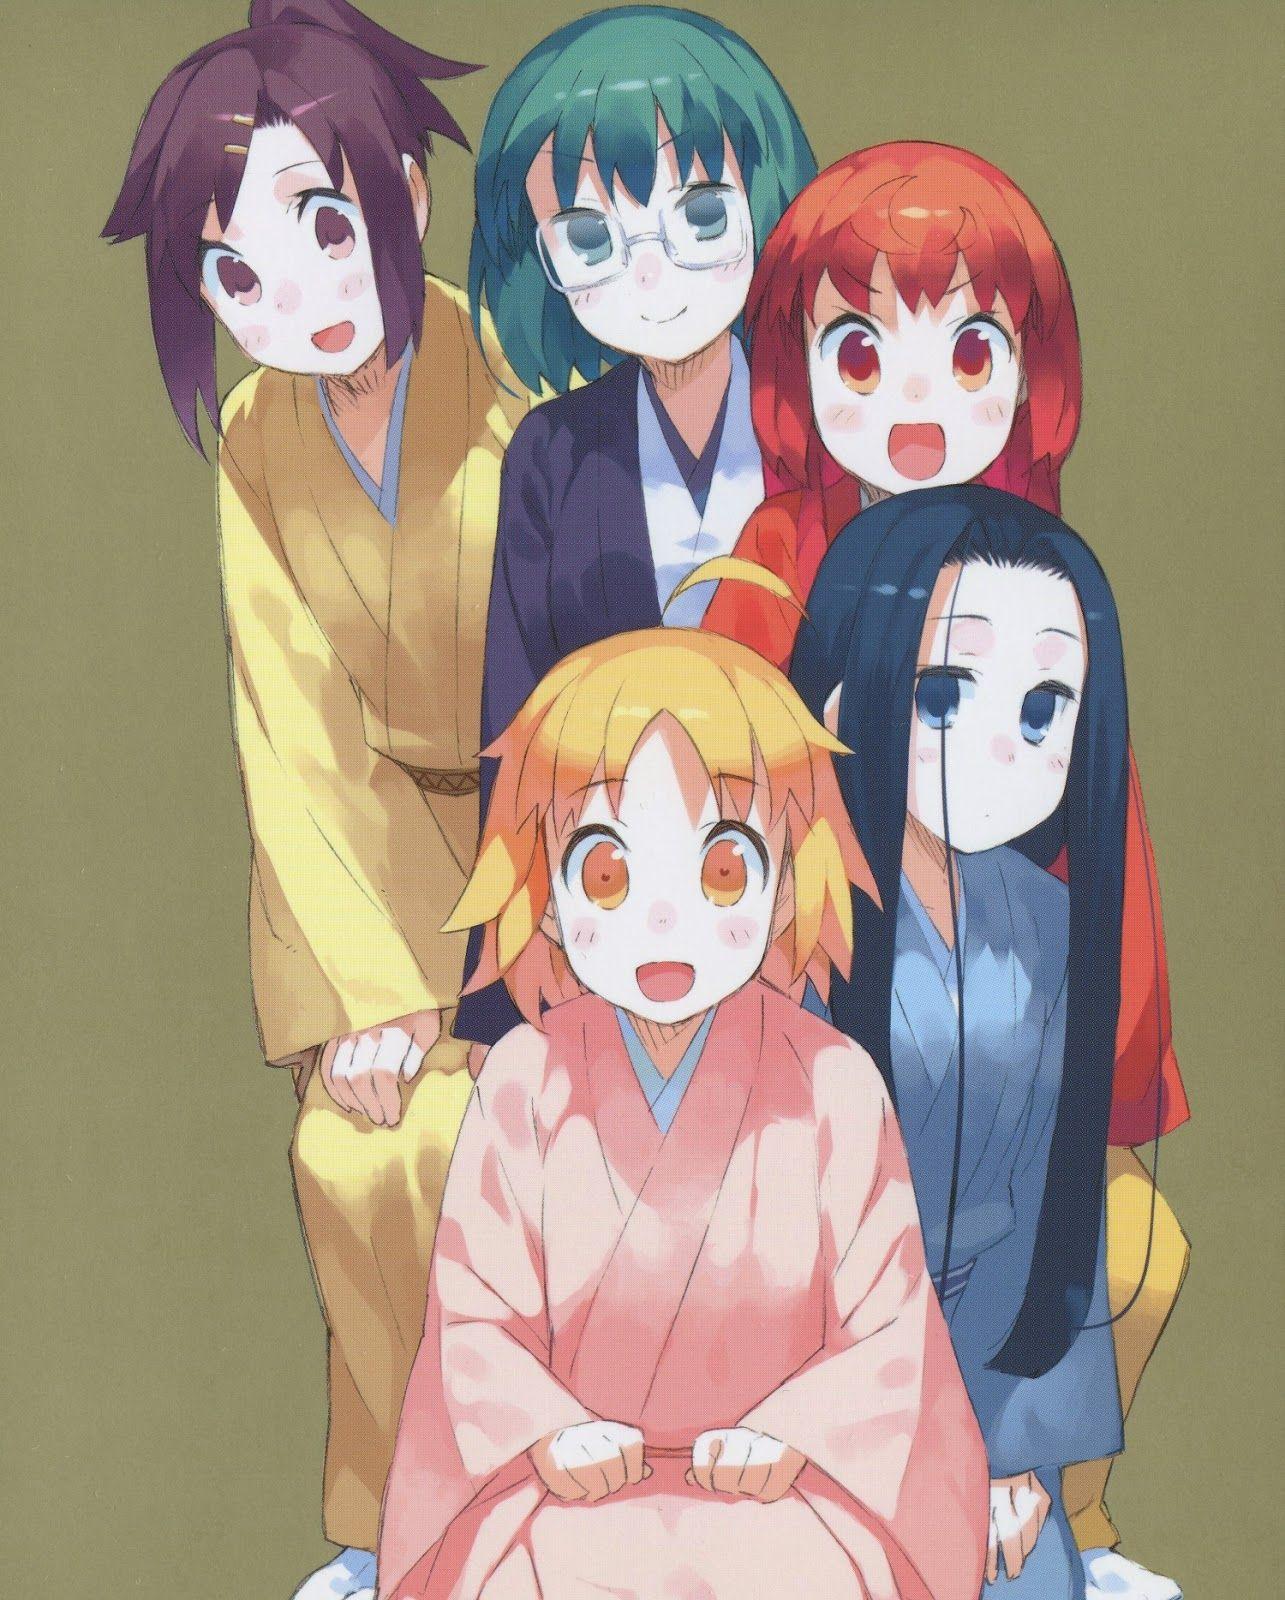 El Manga Joshiraku de Kouji Kumeta y Yasu tendrá adaptación a obra de teatro en Junio.